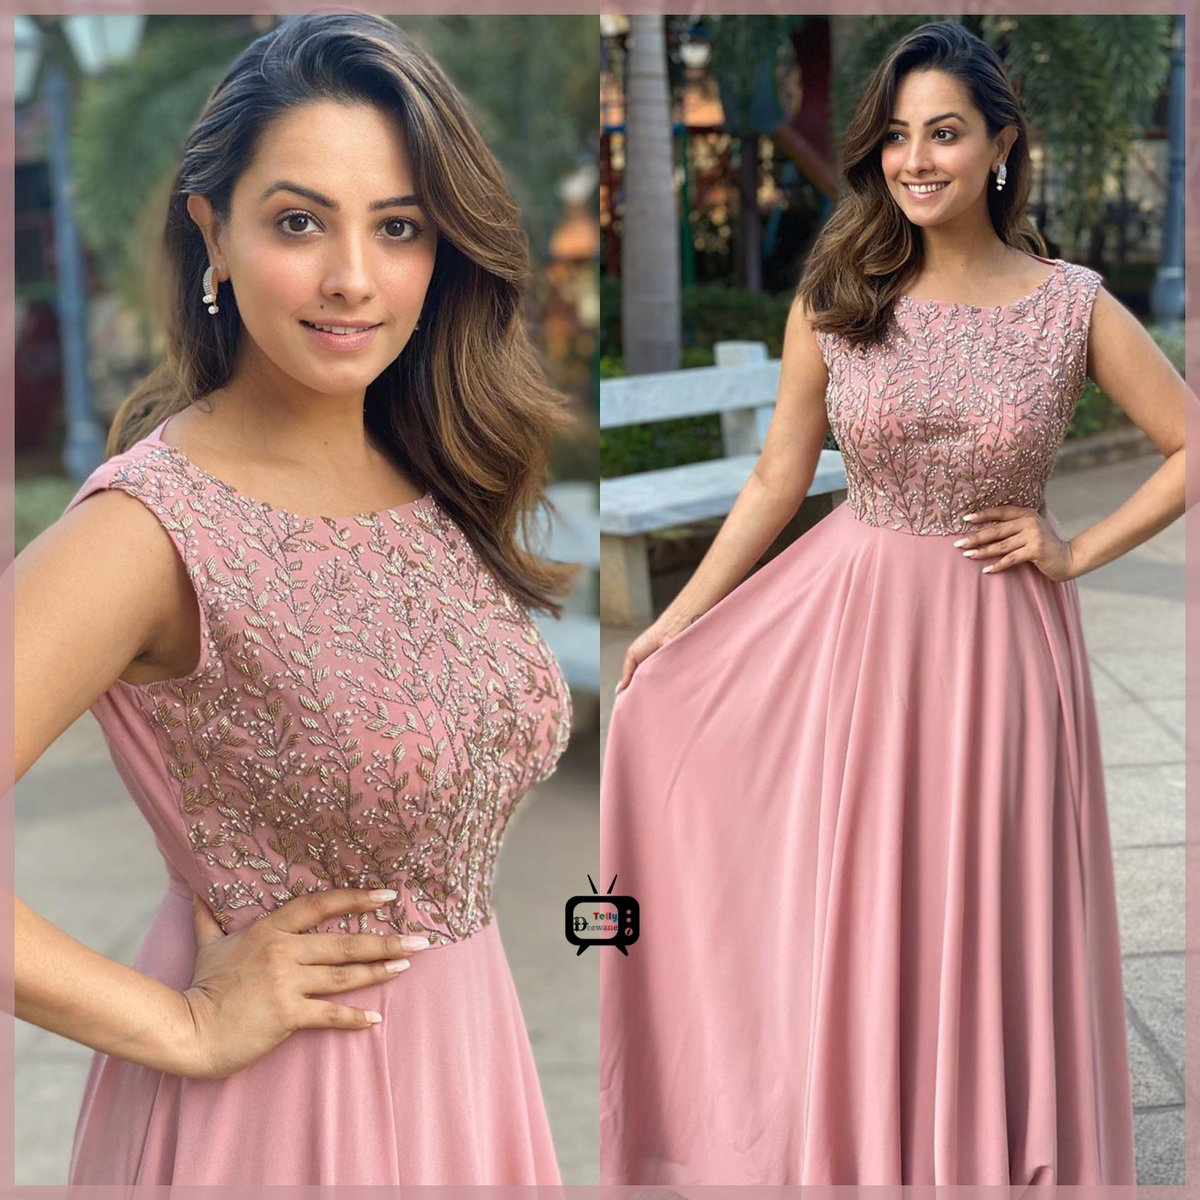 Gorgeous Anita Hassanandani #AnitaHassanandani #Naagin4  #AnitaHassanandaniReddy #Vishaka #Vish  #Naagin3 #Shagun #YHM  @TellyDeewanepic.twitter.com/uhrx4C6kWd